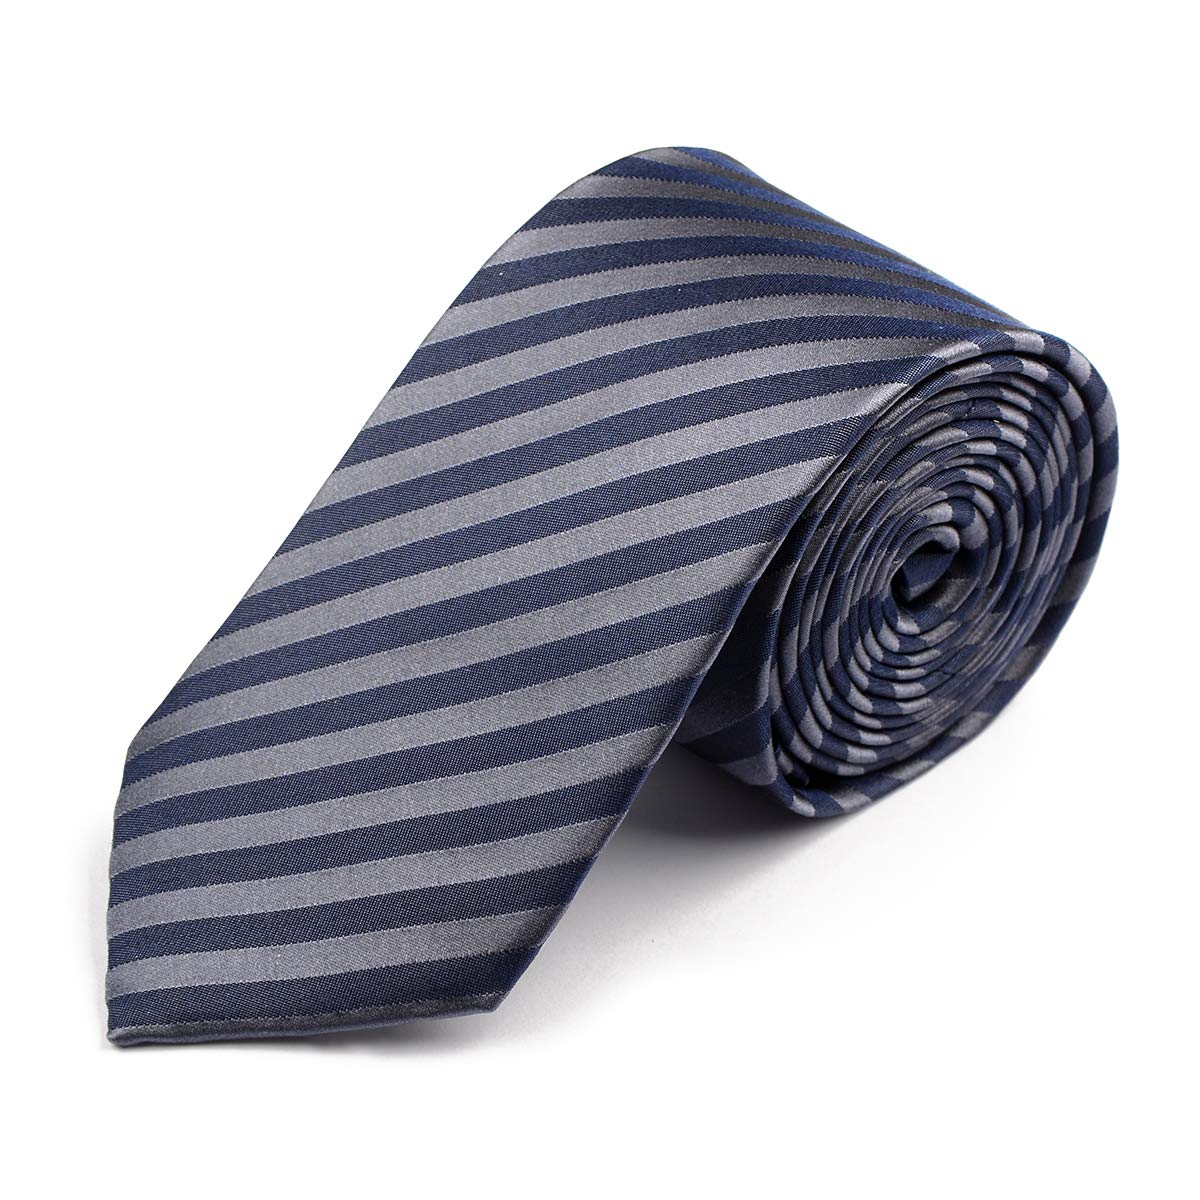 Venti Corbata Extra Larga Rayada en Azul Marino, One Size:One Size ...